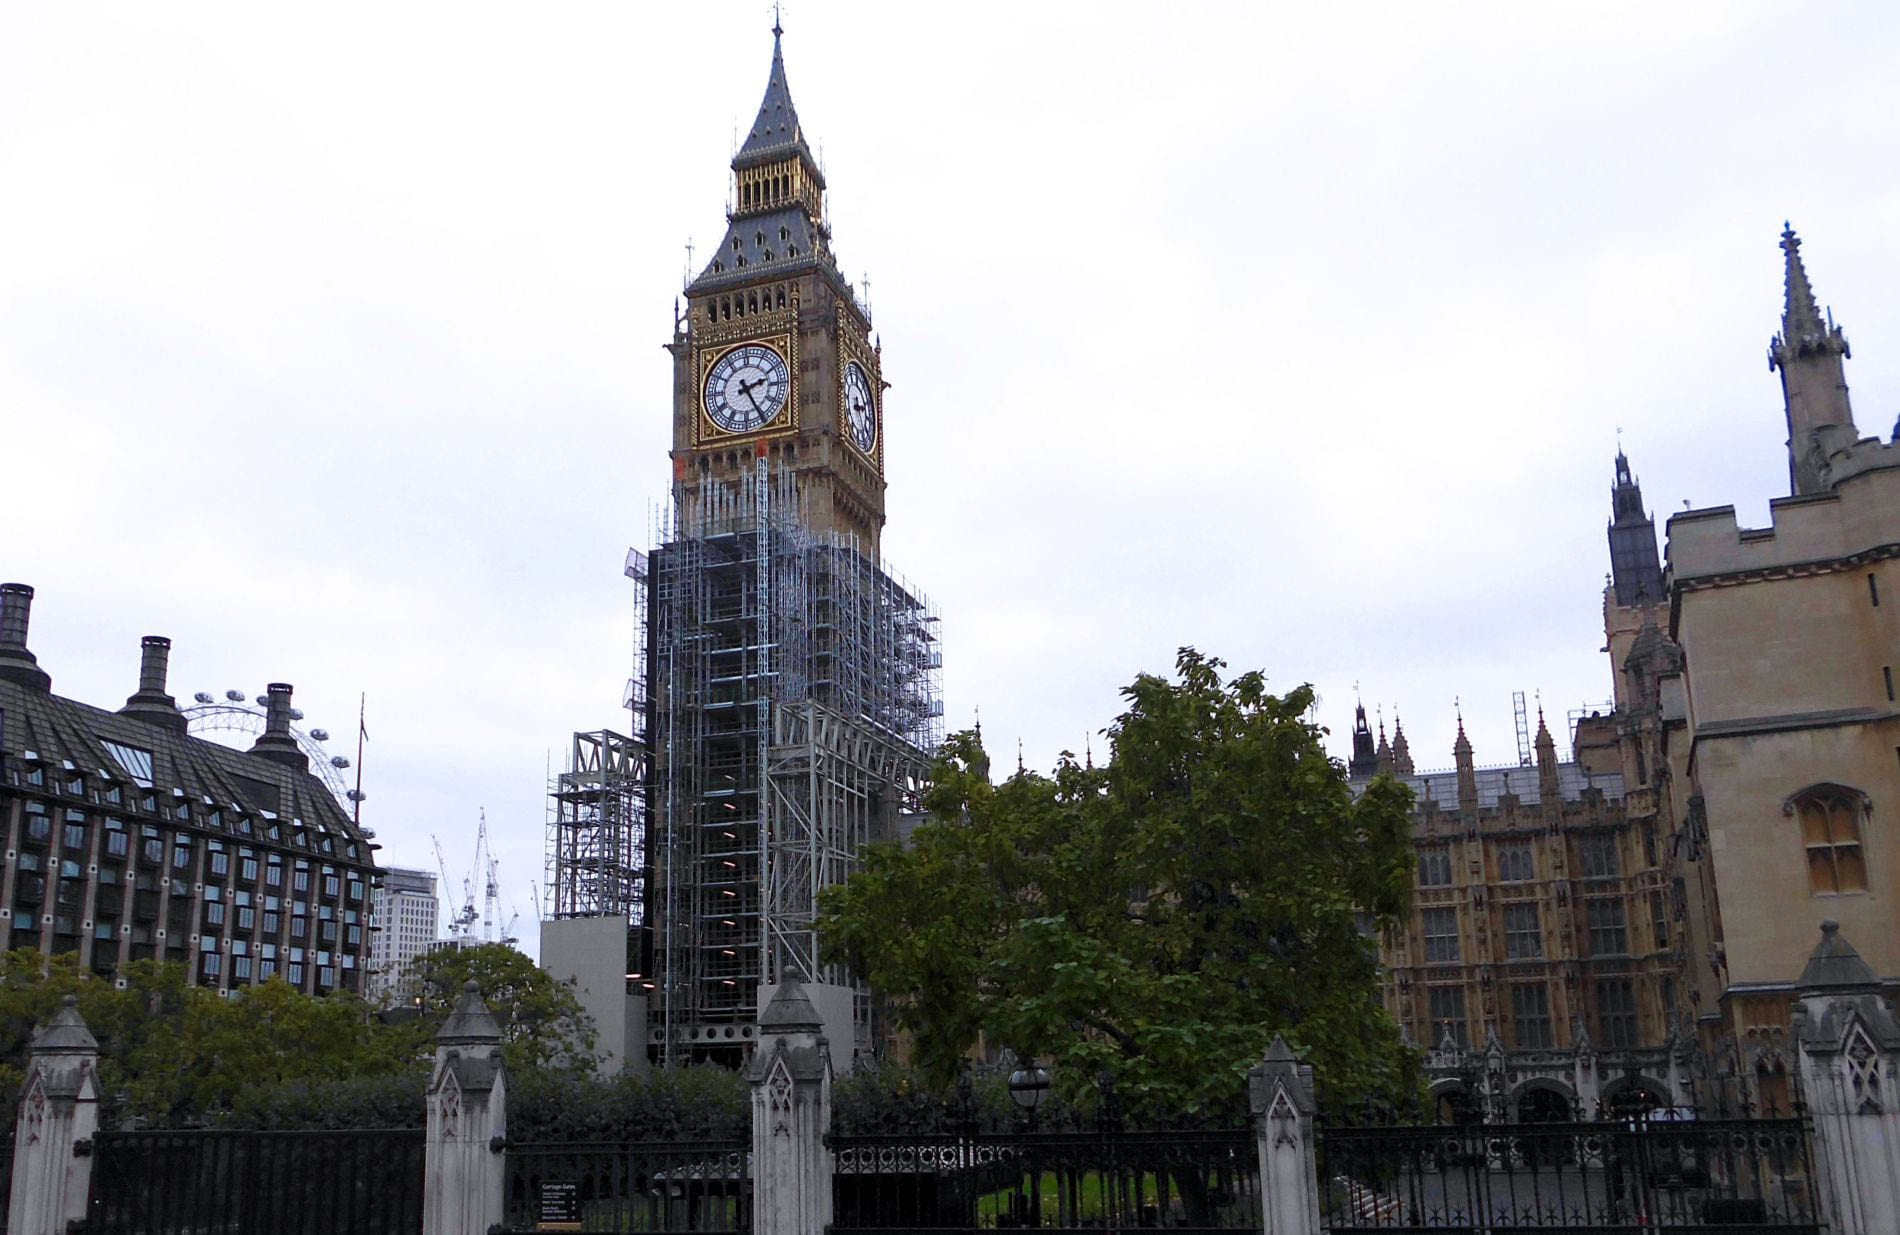 El Big Ben de Londres en obras